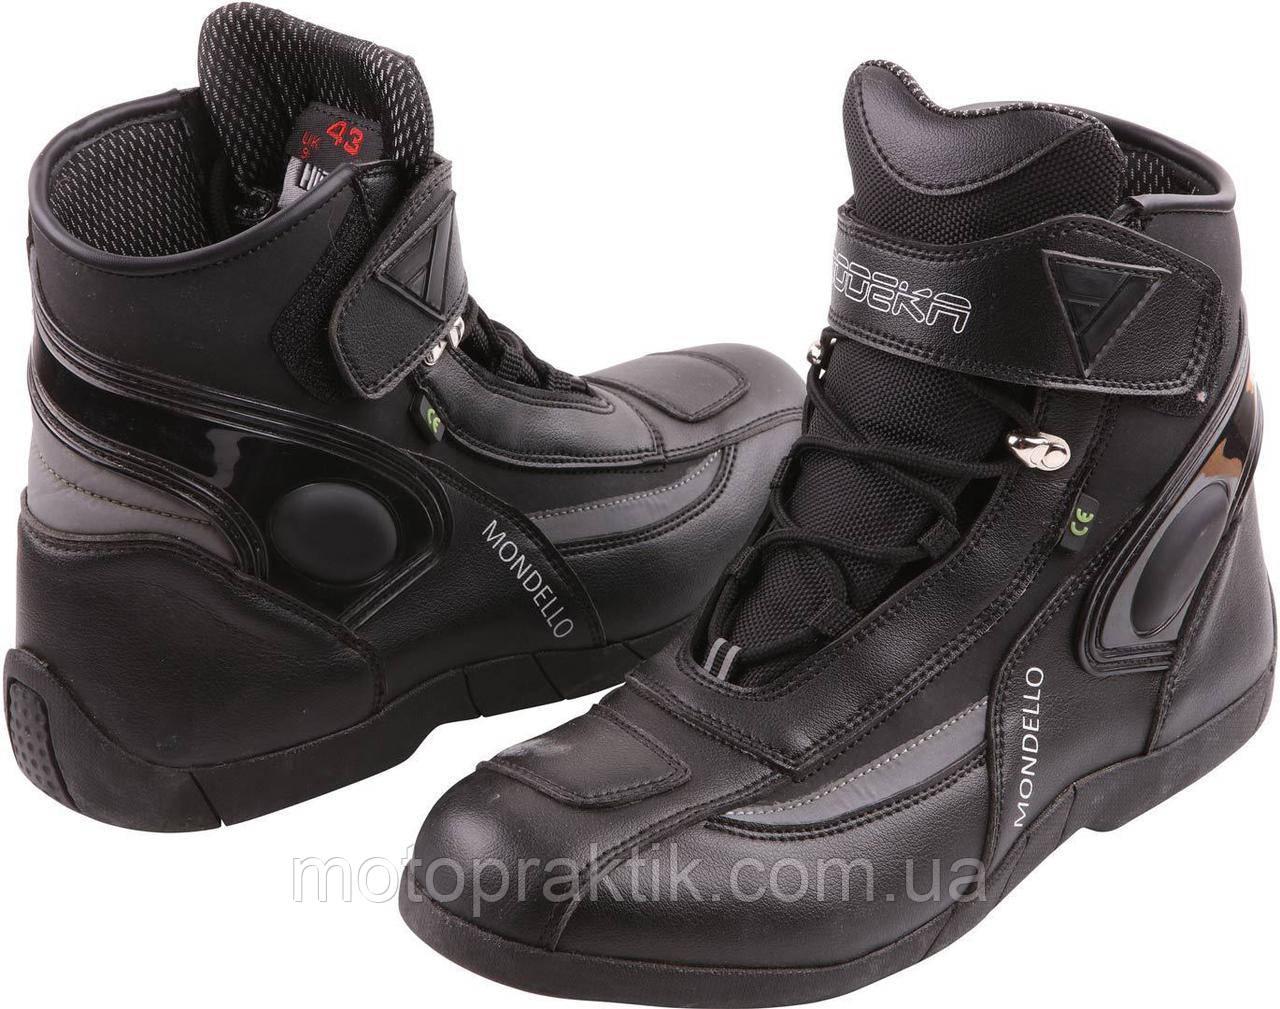 Modeka Mondello Boots Black, EU37 Мотоботинки городские с защитой